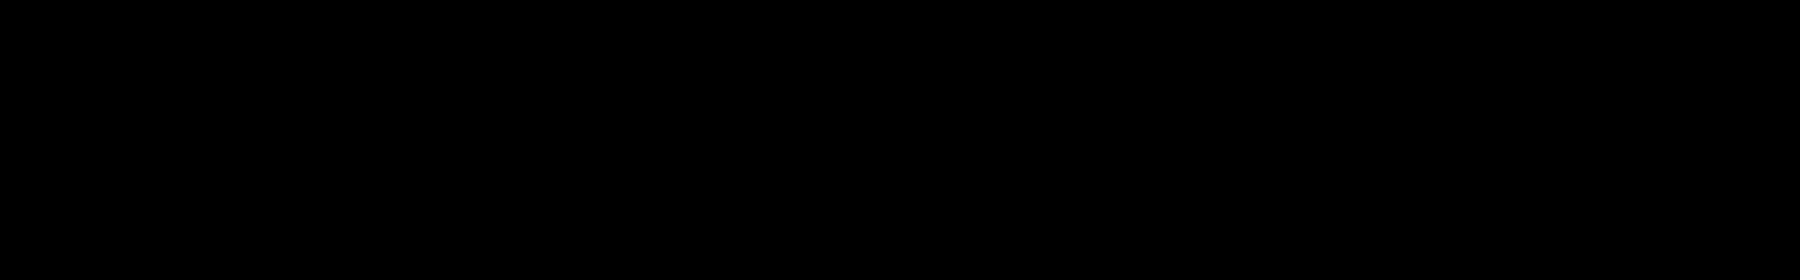 Solarpunk audio waveform